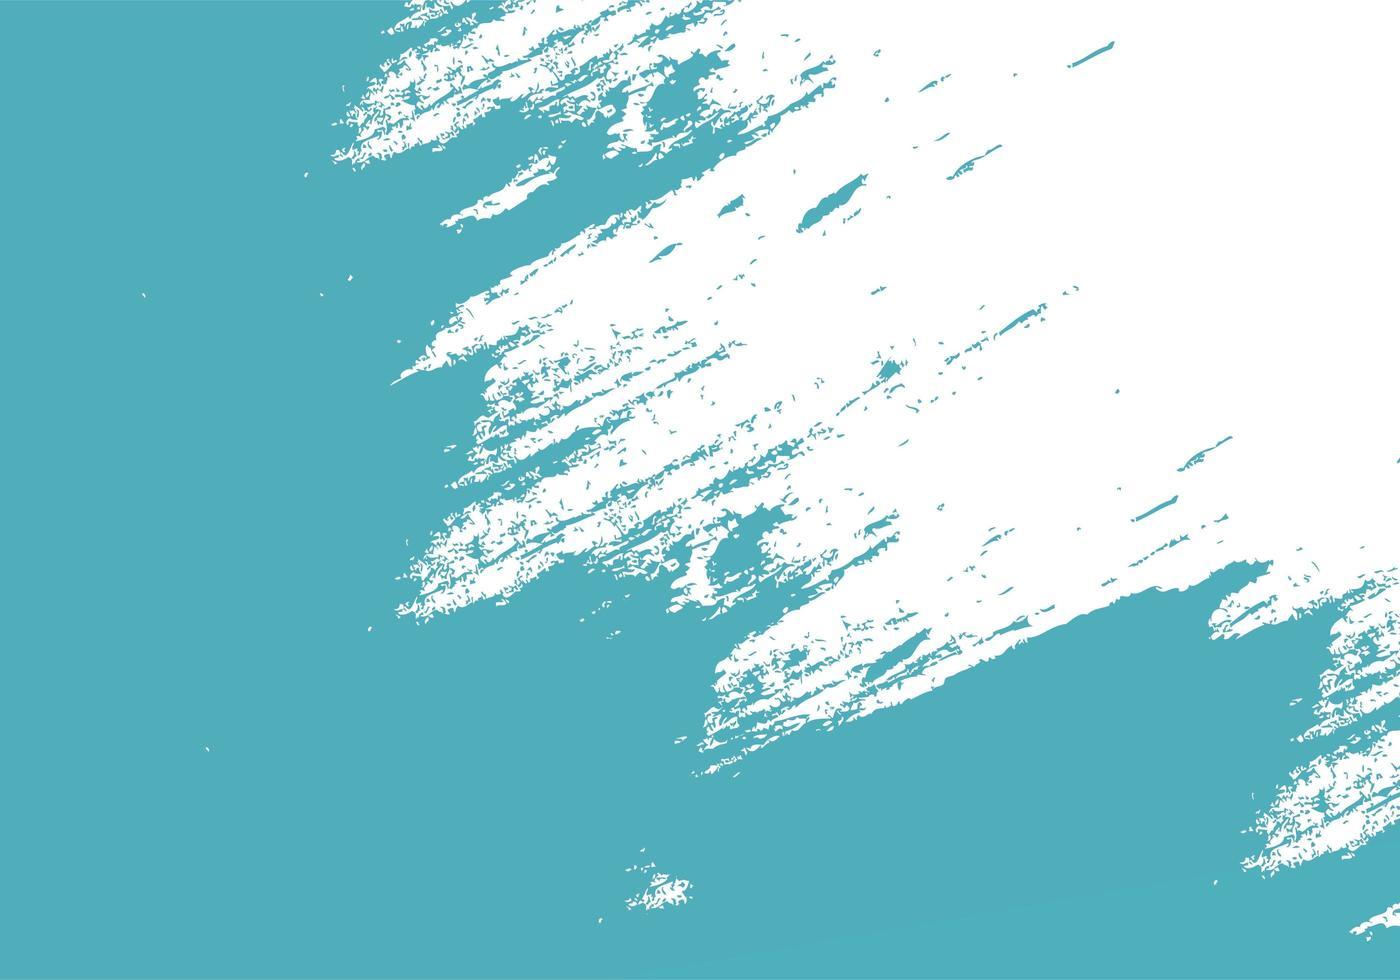 grungy blaugrüne Tinte Pinselstrich Textur vektor